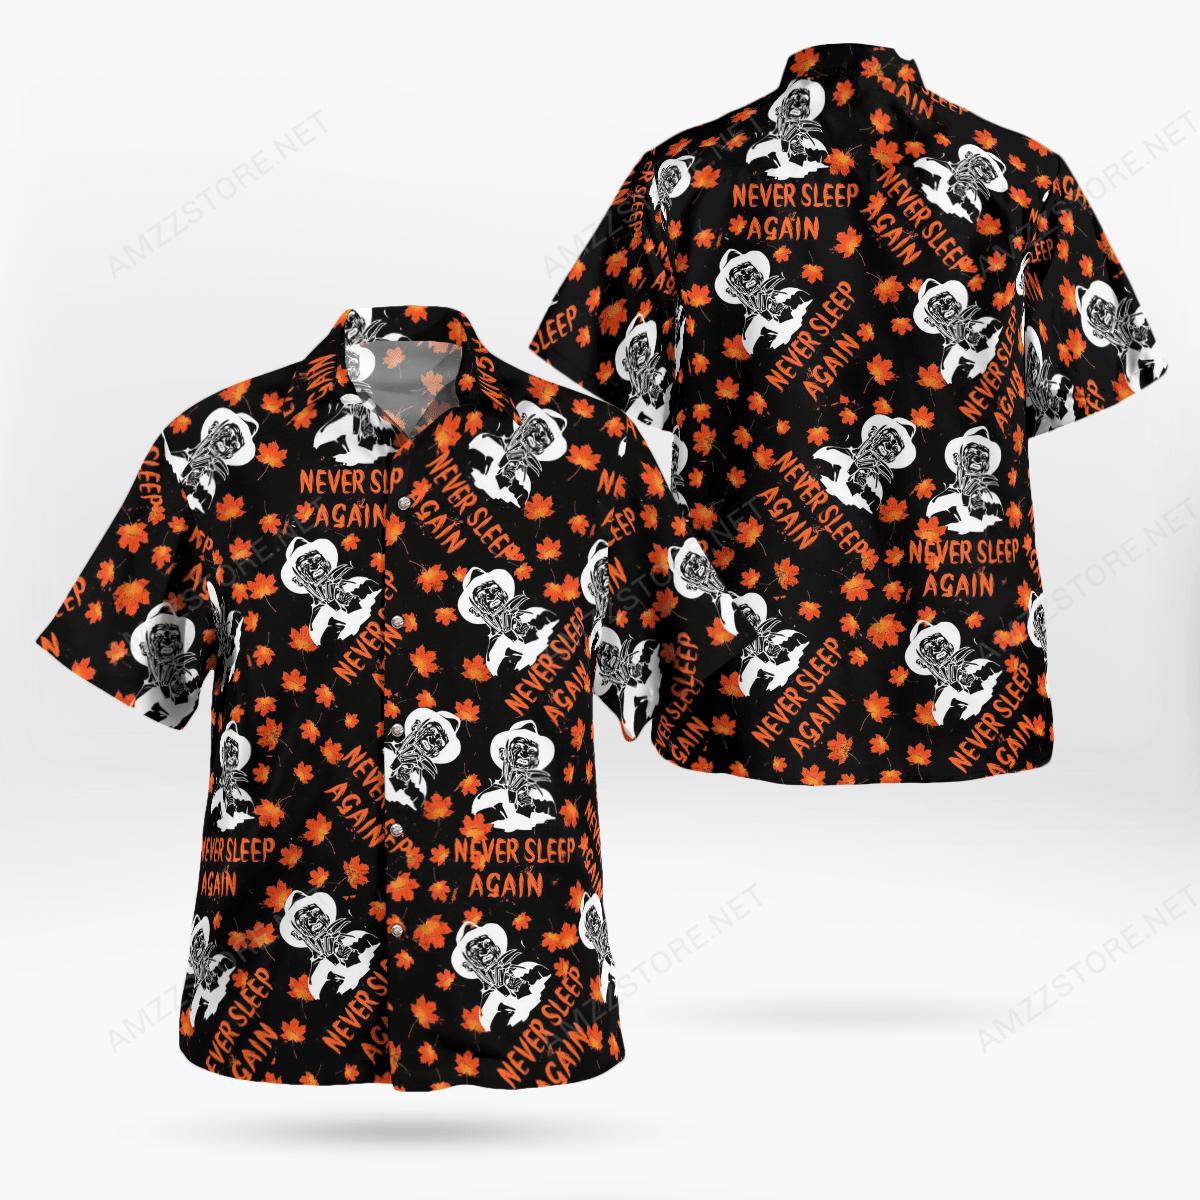 Freddy Krueger never sleep again maple leaf Hawaiian Shirt